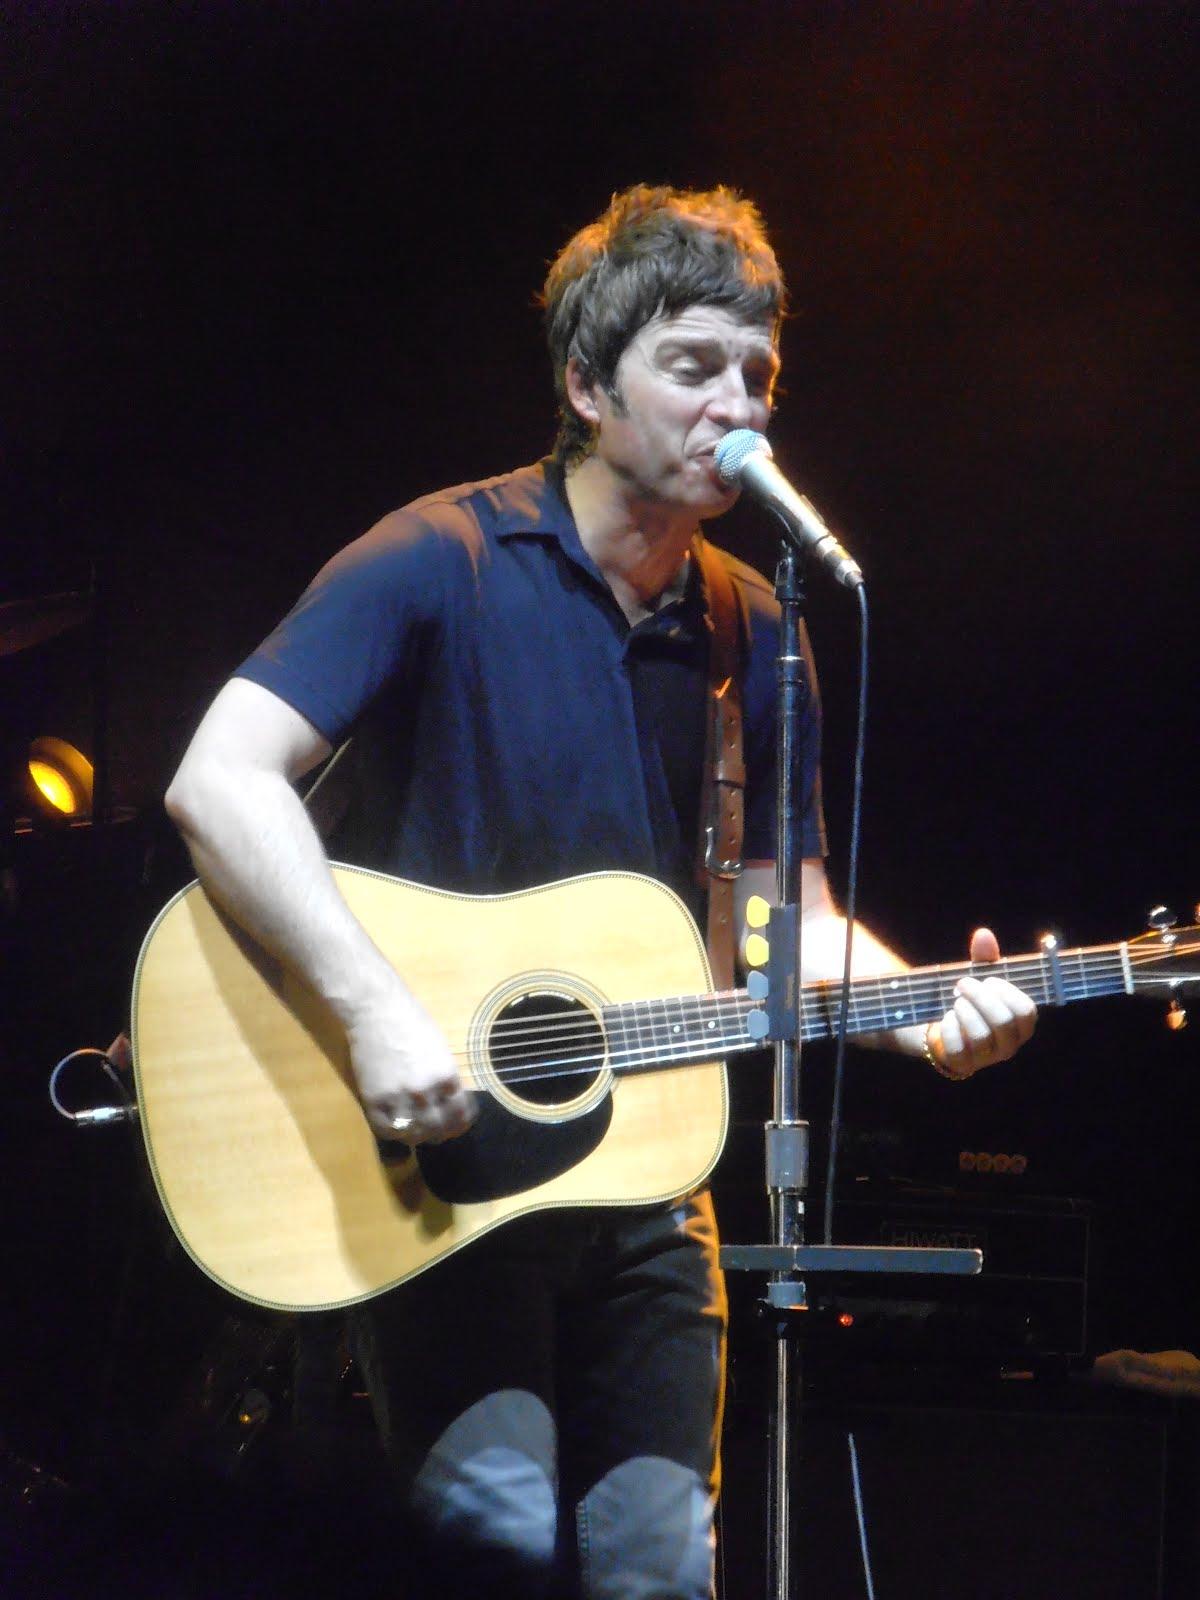 Noel Gallagher Tour Canada